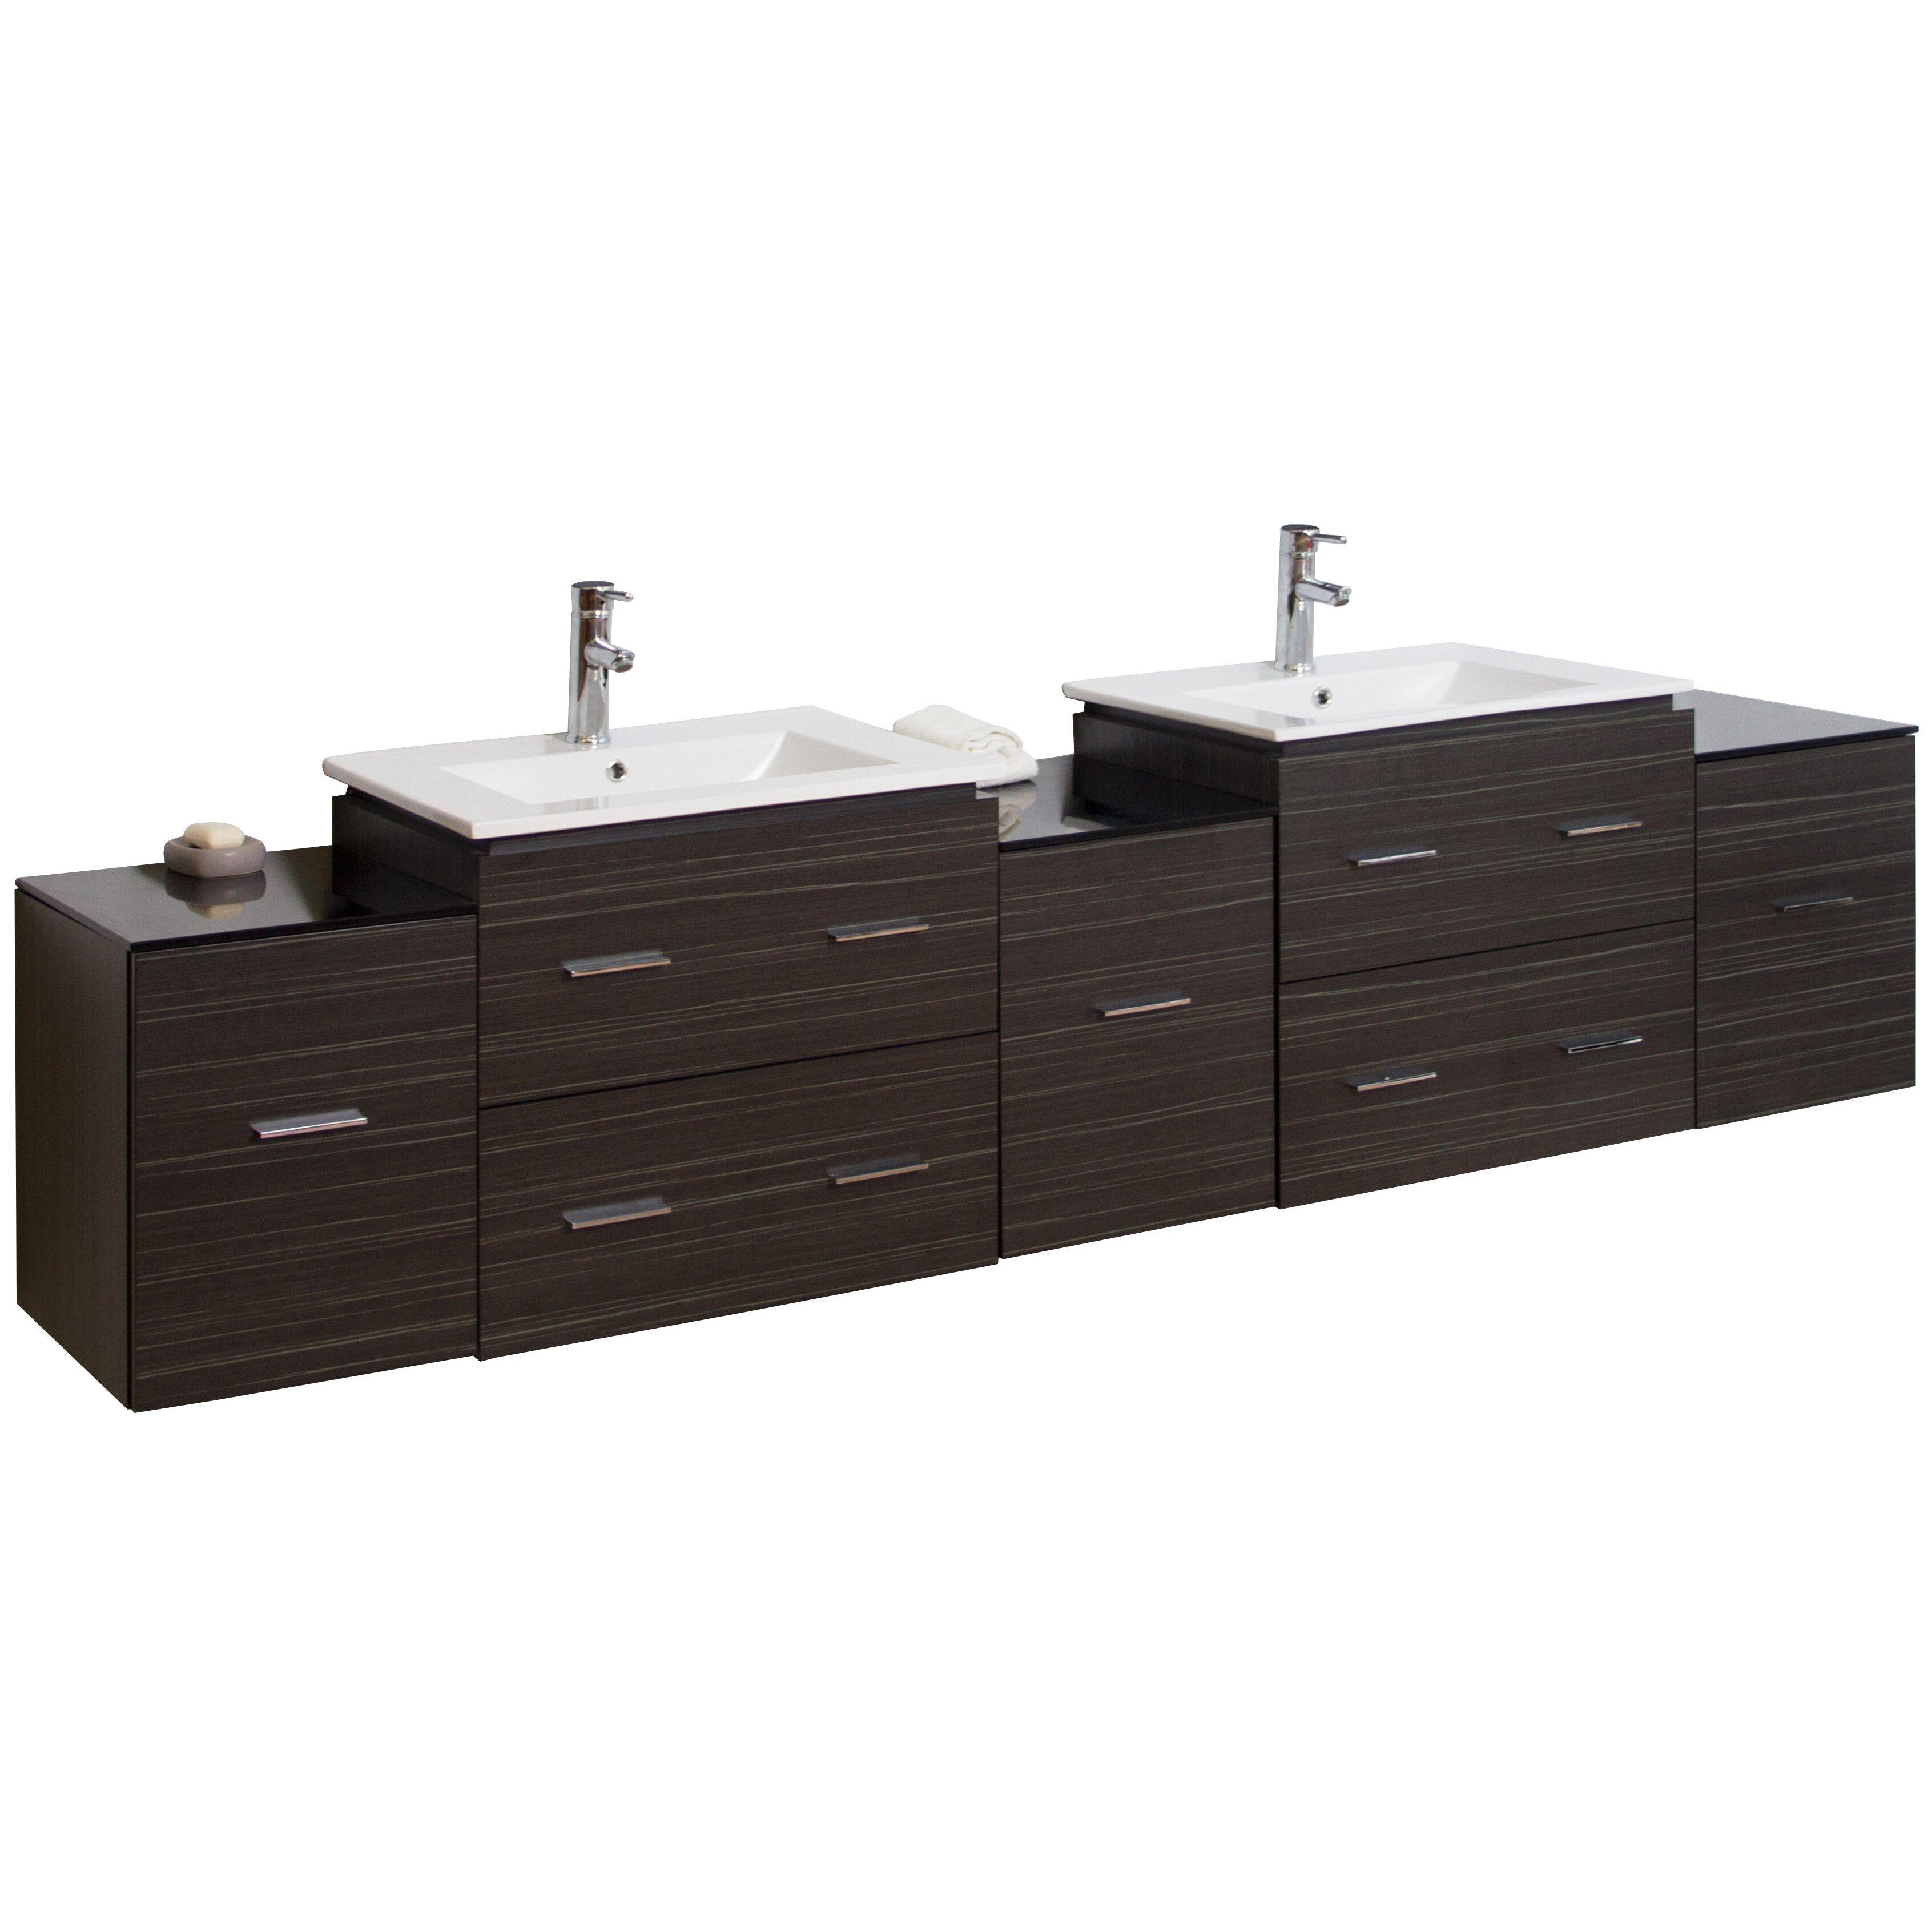 90 Bathroom Vanity American Imaginations 90 Double Modern Wall Mount Bathroom Vanity